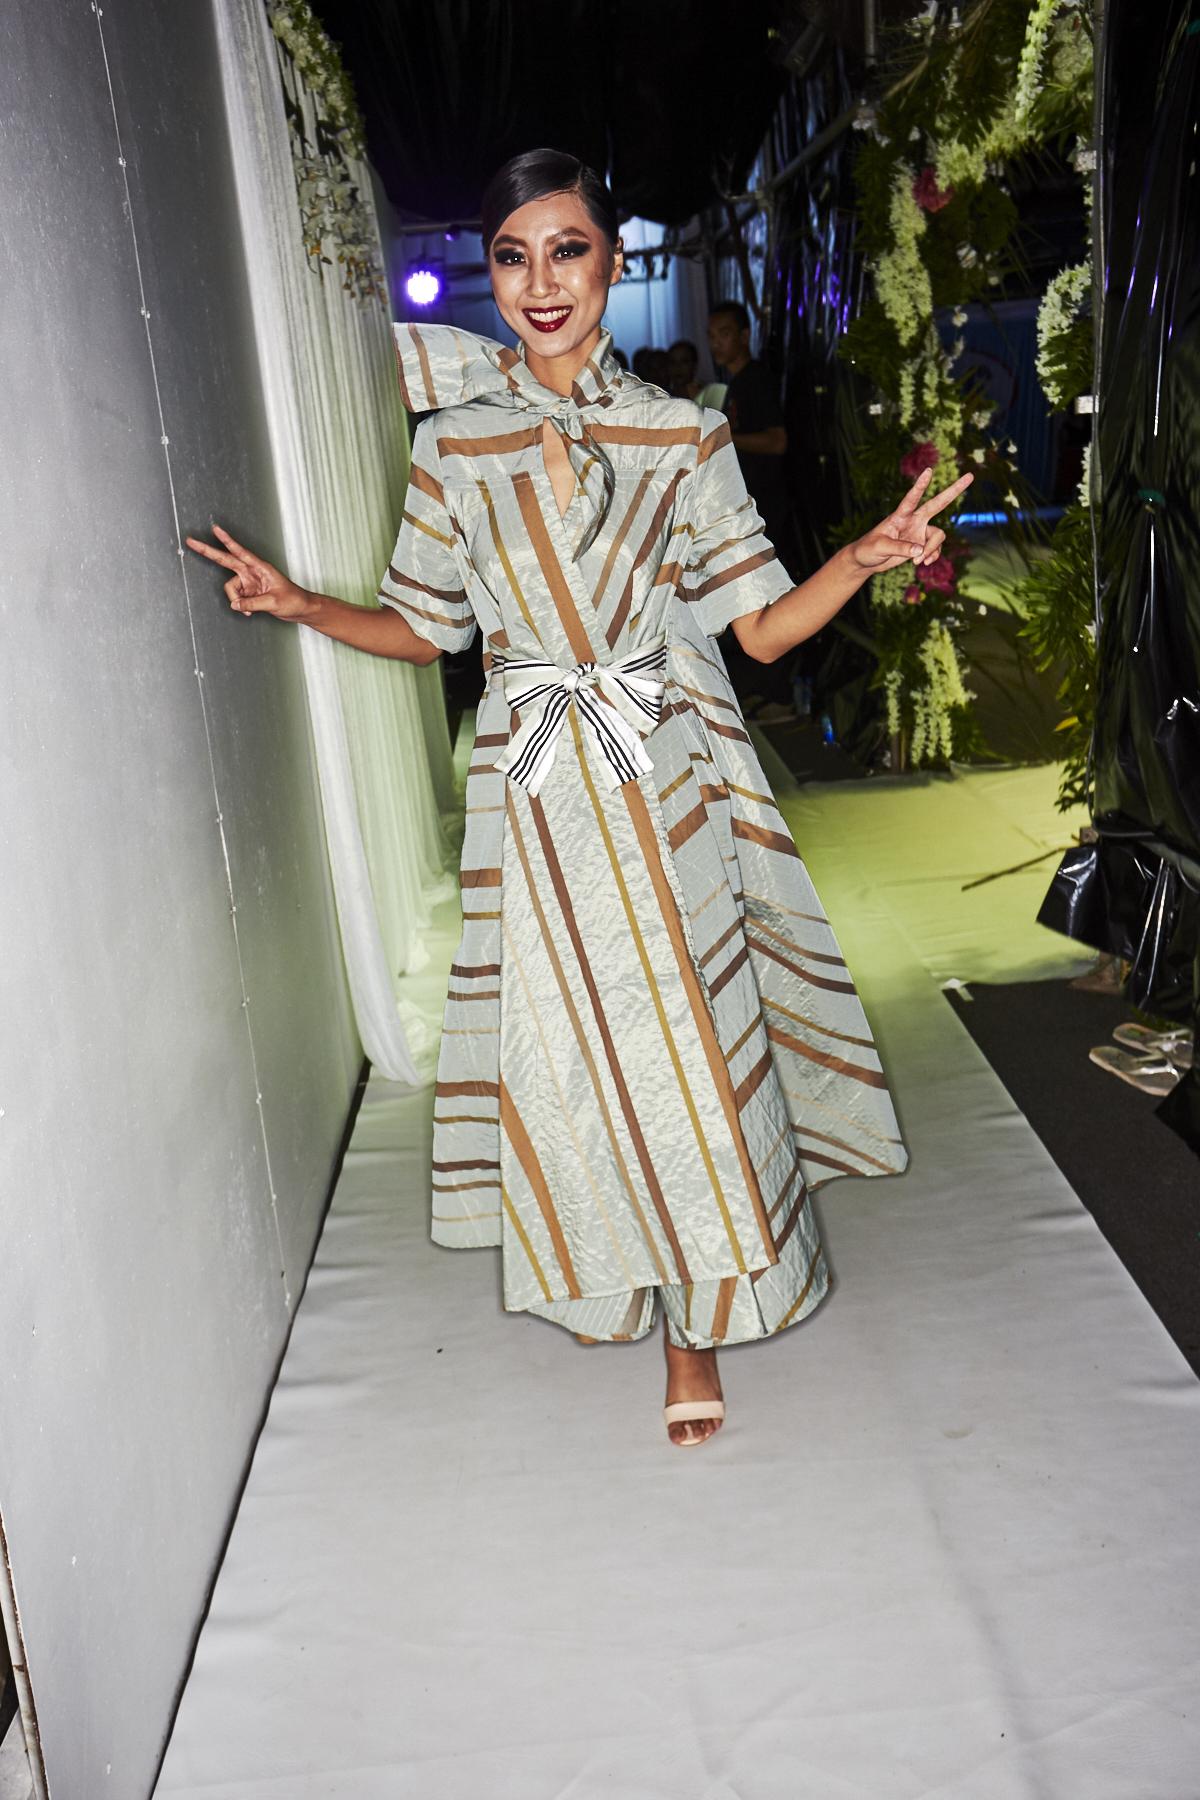 Elaradi by designer Laisiasa Davetawalu Resort Luxe Fashion Show Suva, Fiji Backstage